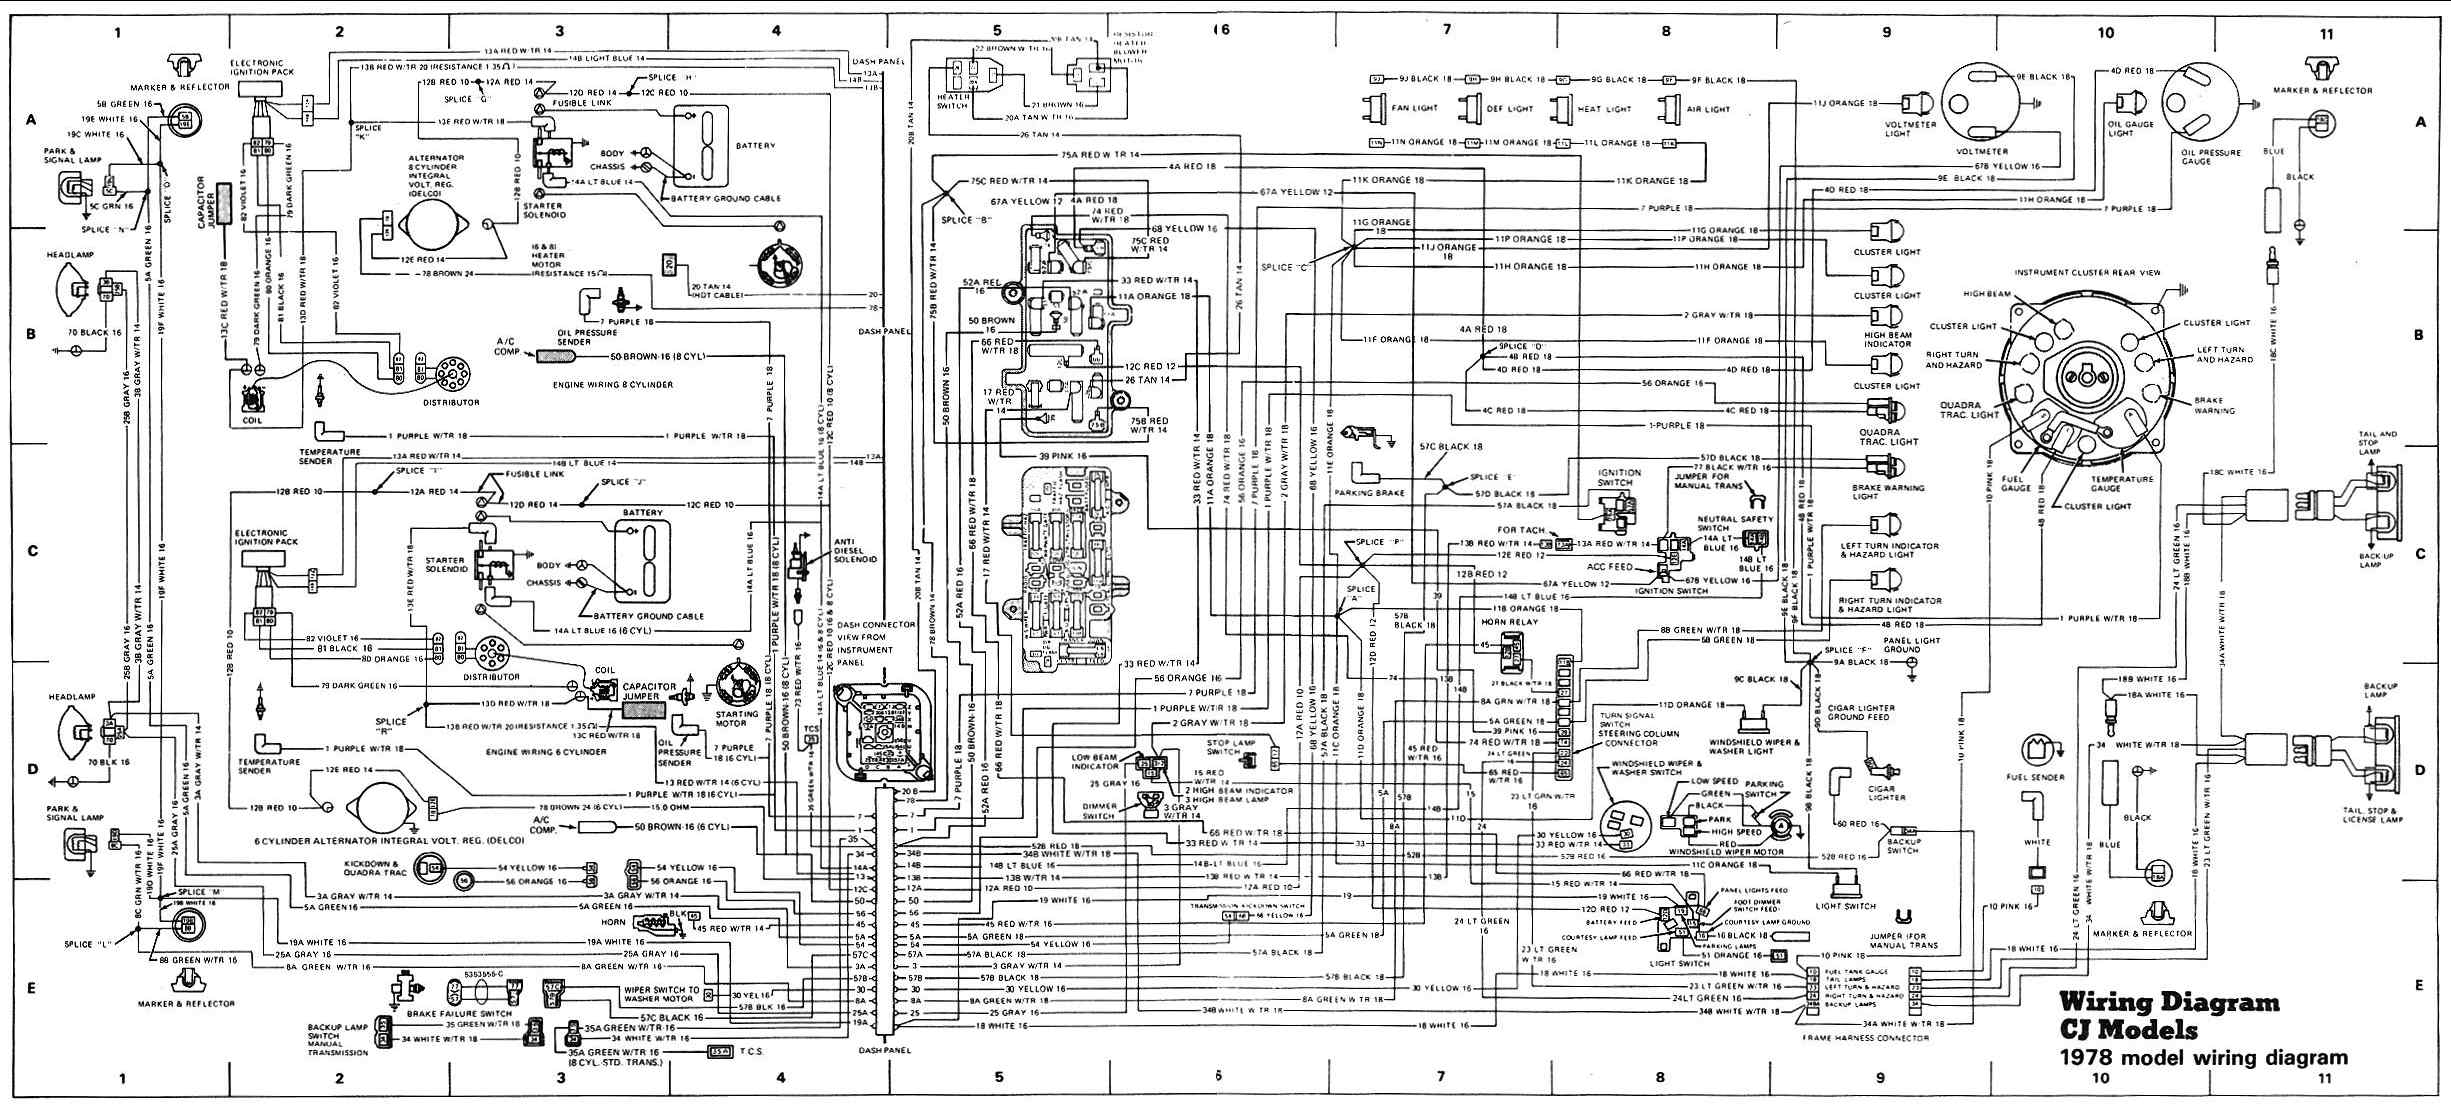 2003 jeep grand cherokee engine diagram online wiring diagram data99 jeep cherokee sport engine diagram best wiring library1998 jeep cherokee sport engine wiring diagram